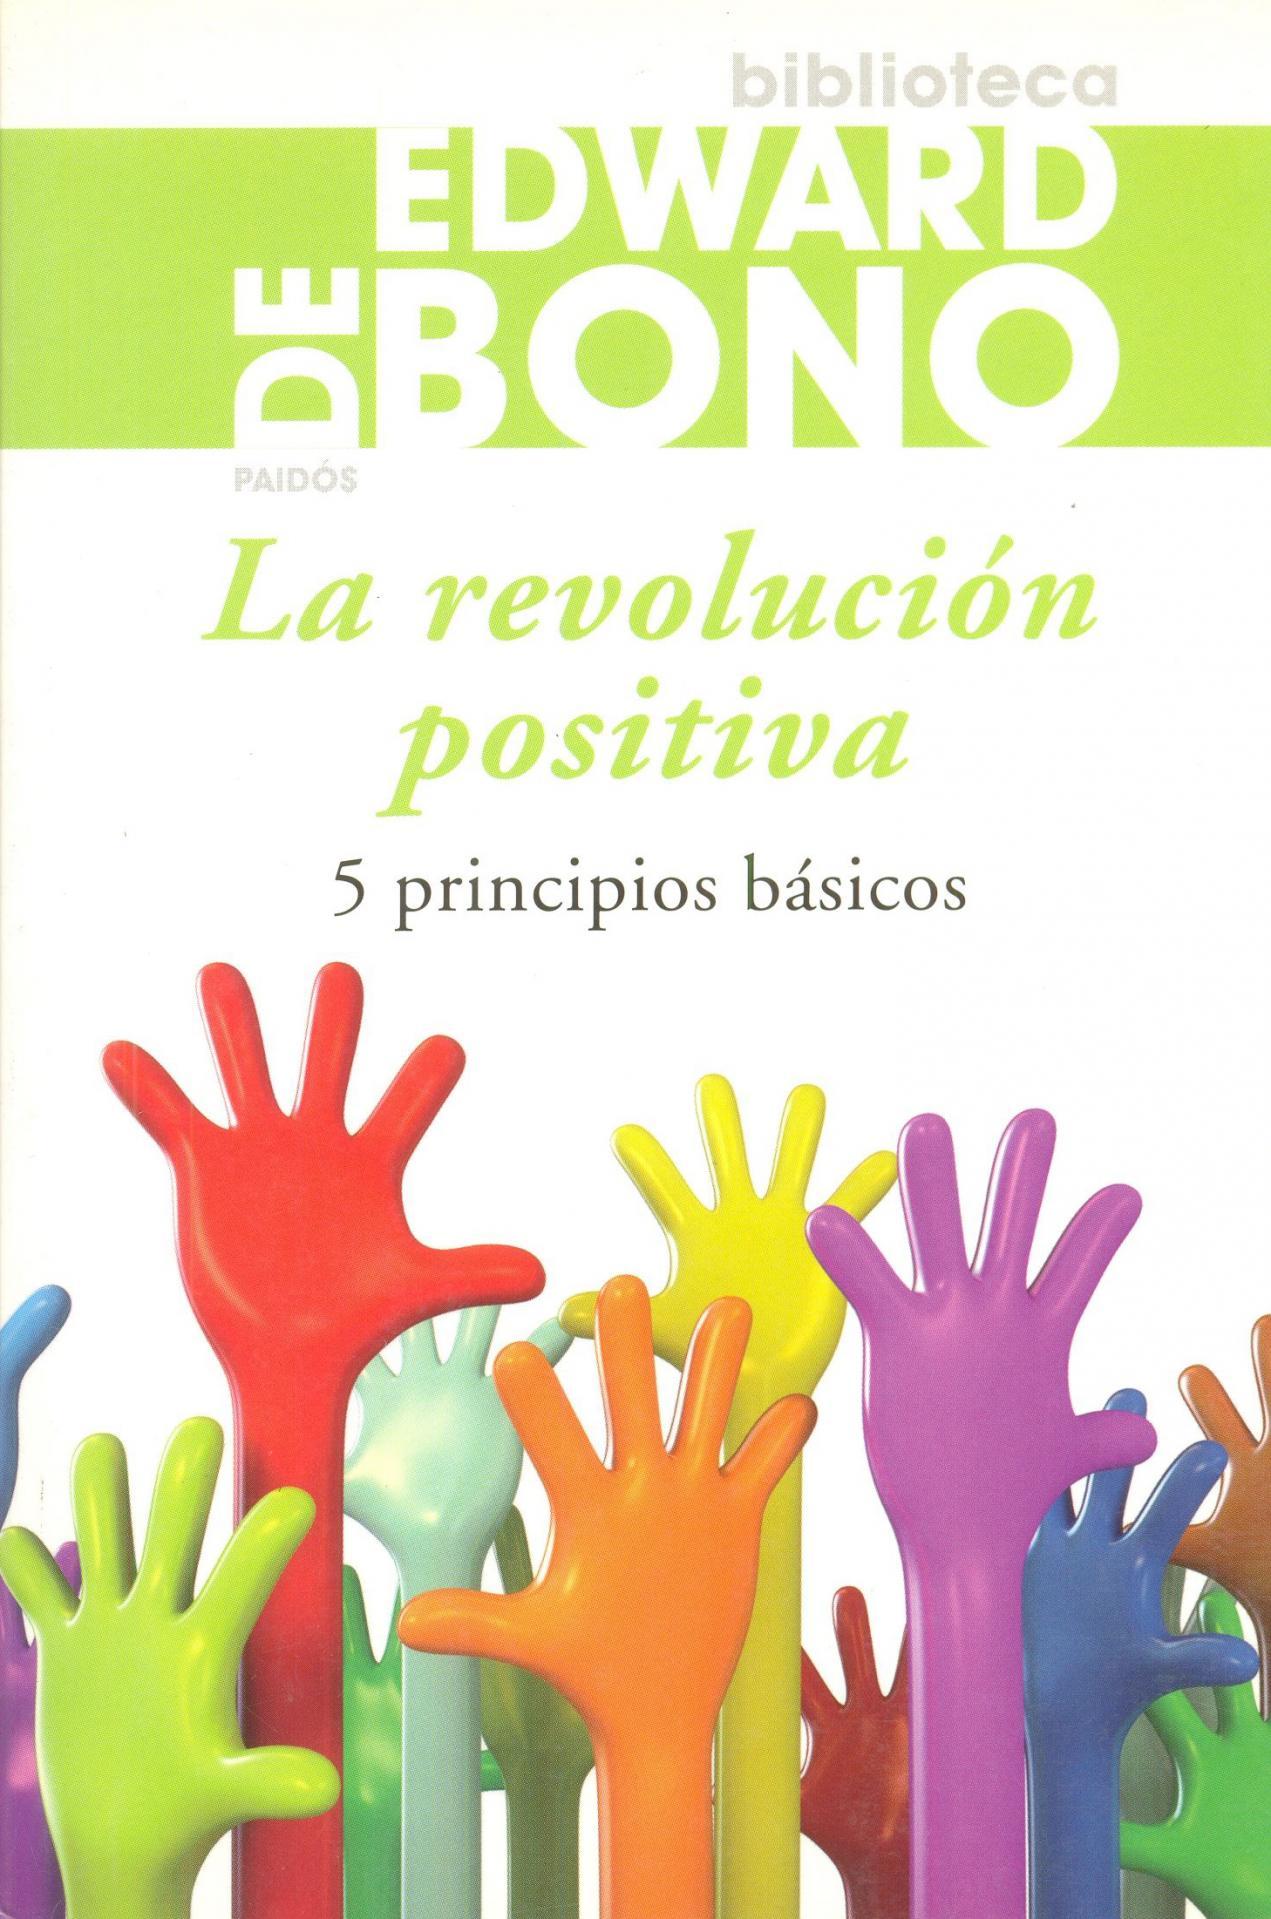 LA REVOLUCIÓN POSITIVA. 5 principios básicos. De Bono, E.